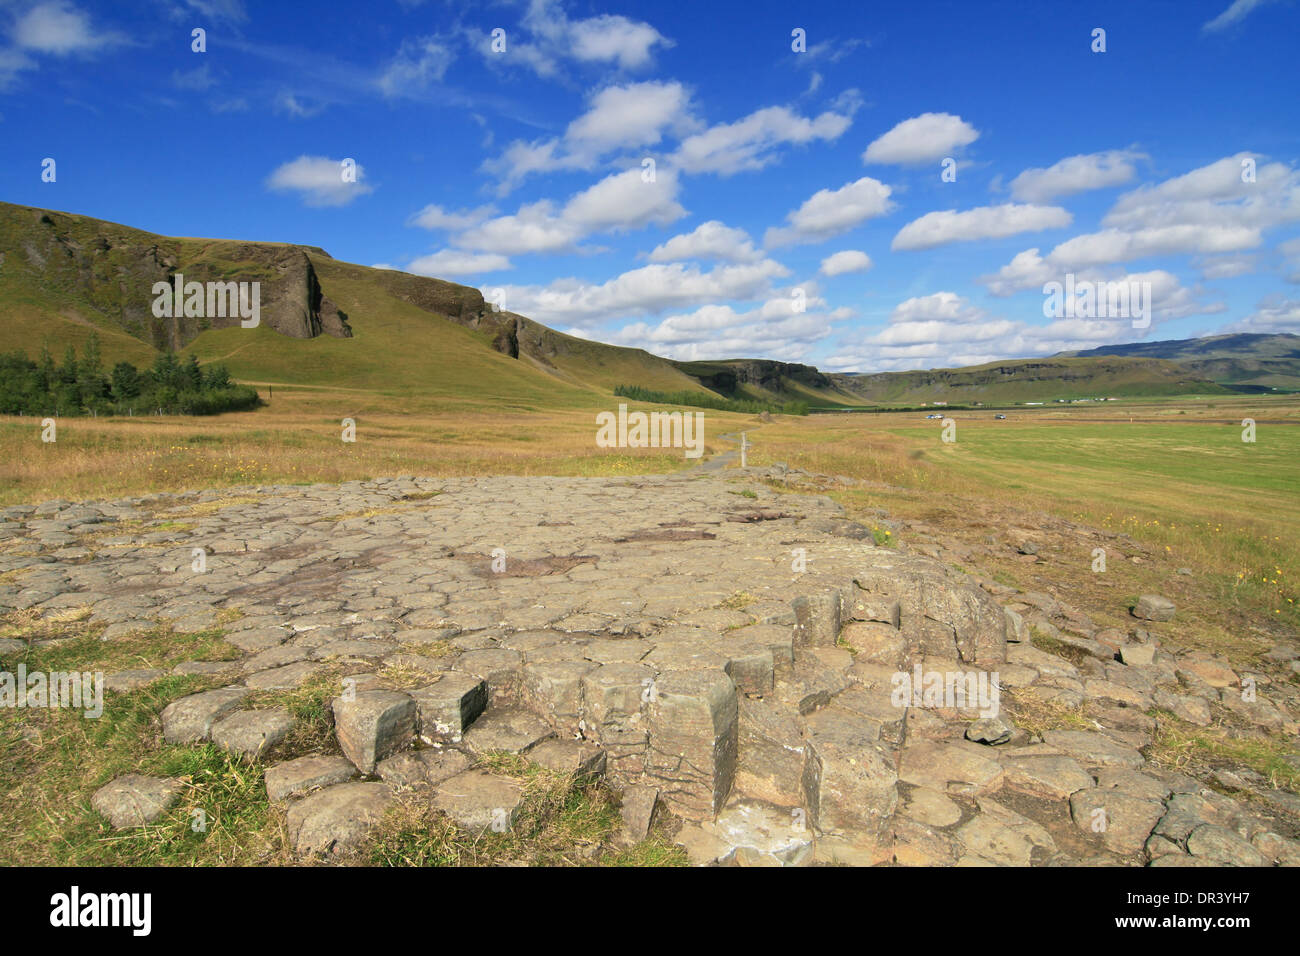 Pavement of columnar basalt in pentagonal shapes near Kirkjubaerjarklaustur in Southern Iceland. - Stock Image